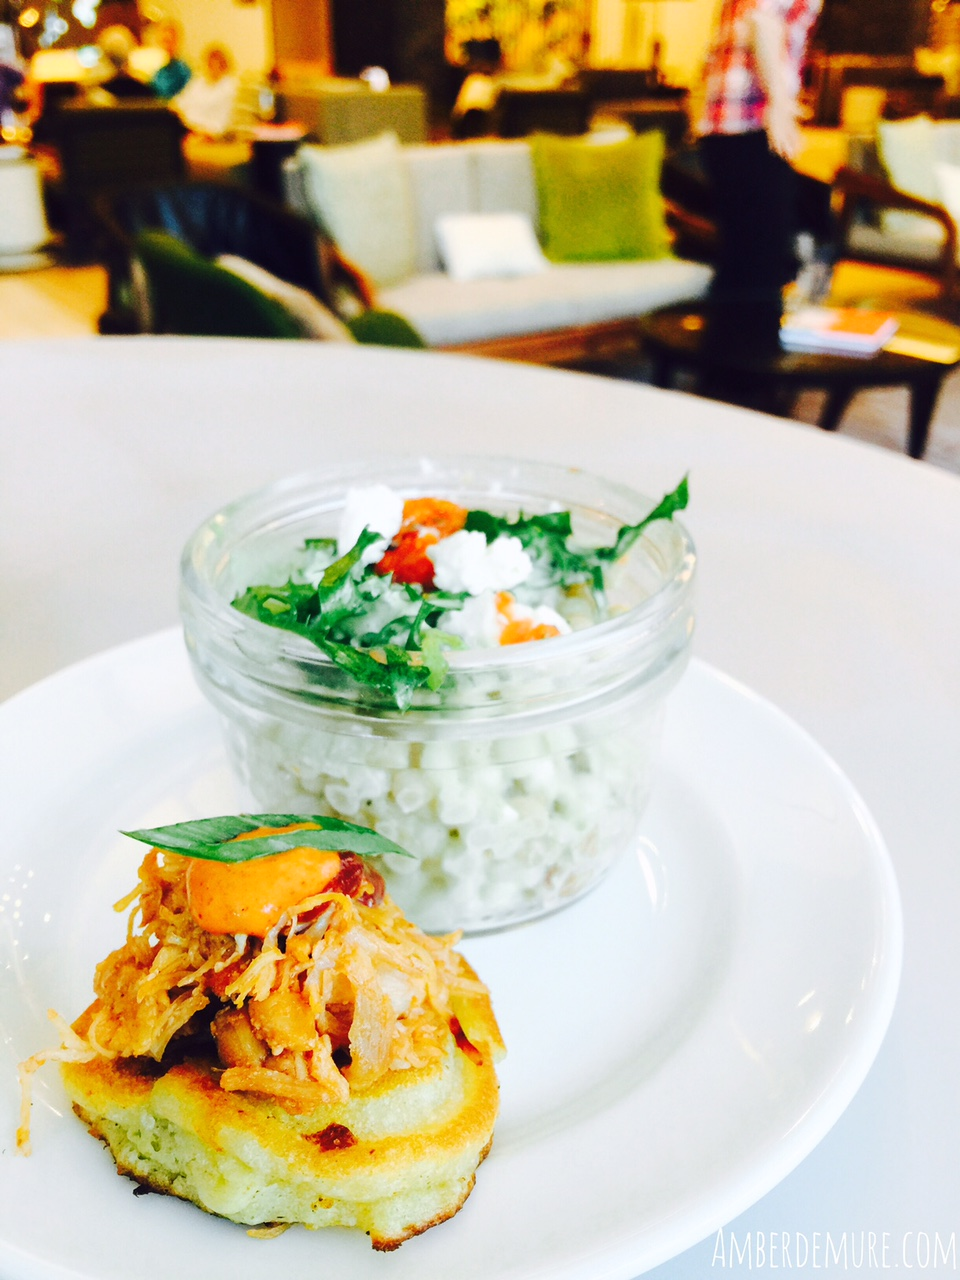 Dining Downtown: Stella San Jac   amber demure